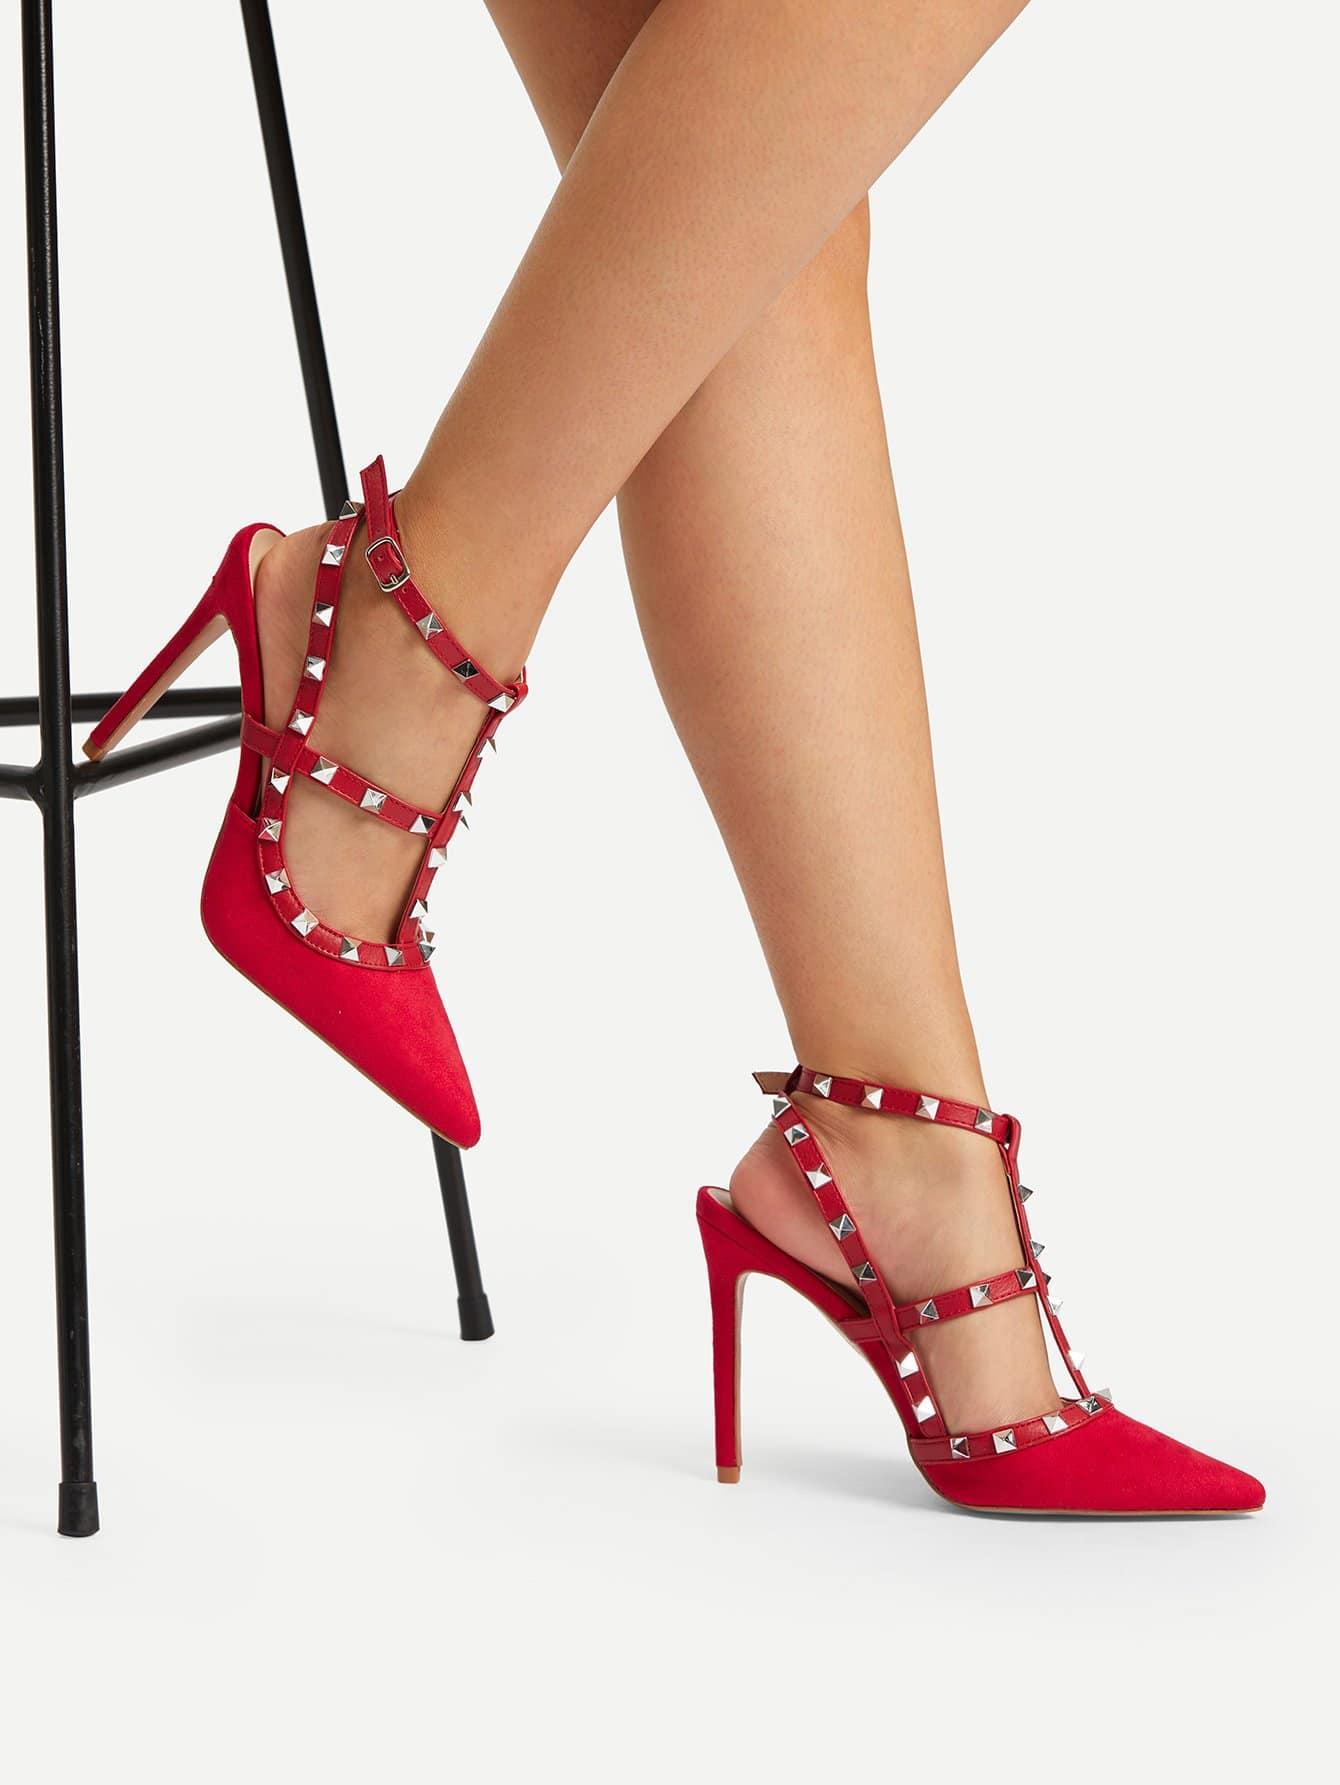 History of high heels fashion 30